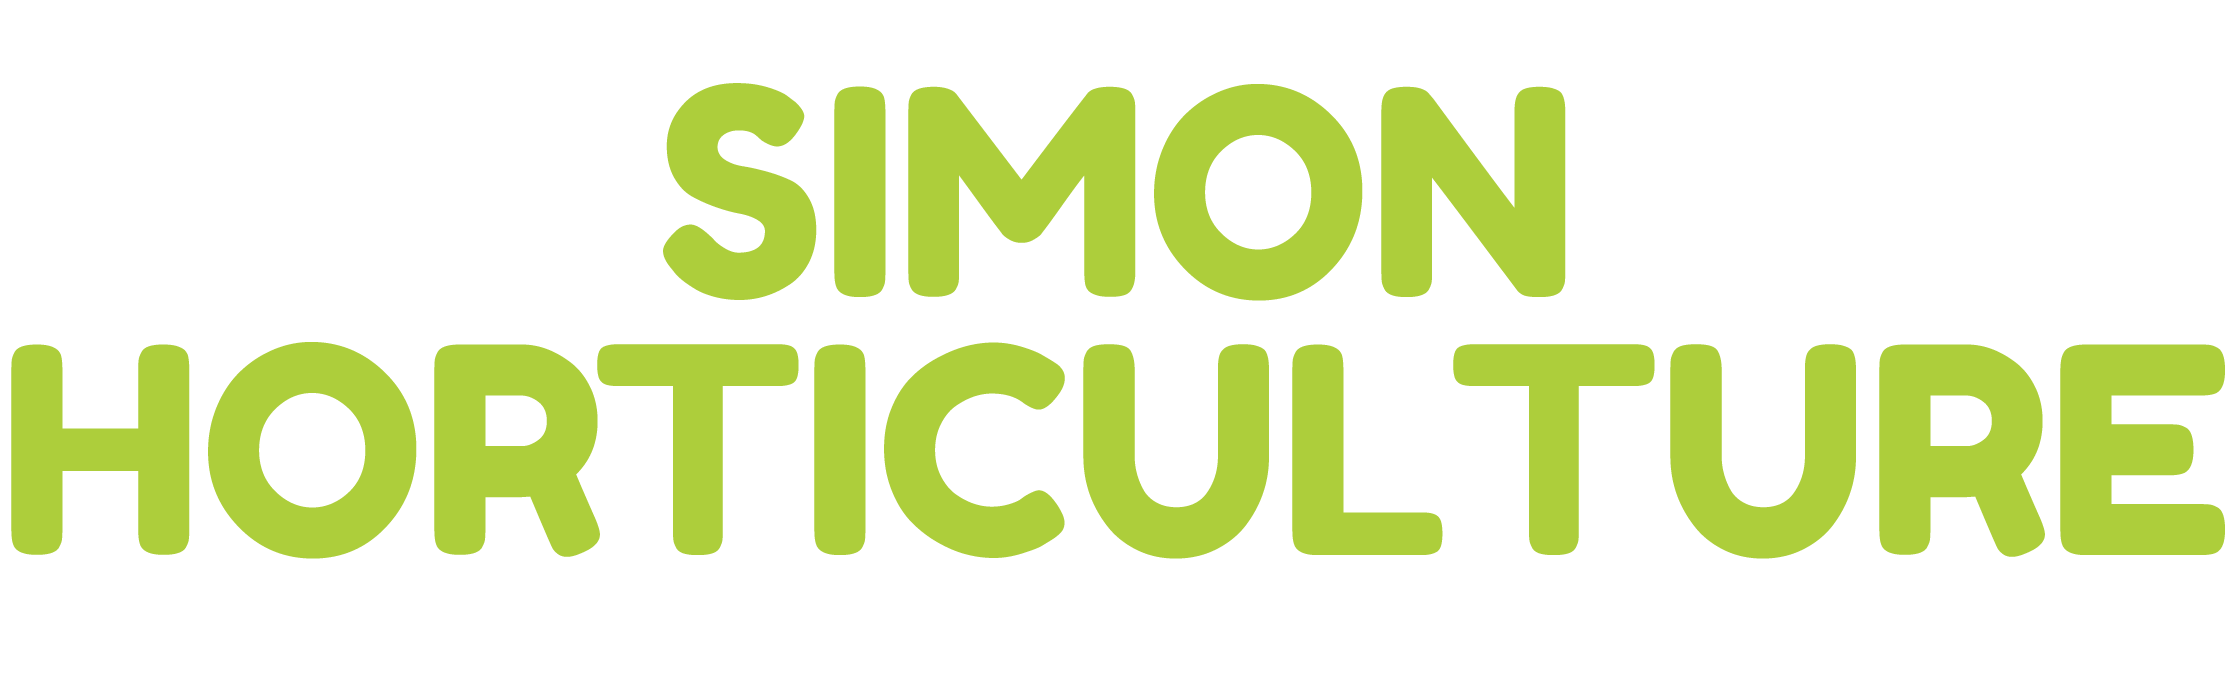 Simon Horticulture